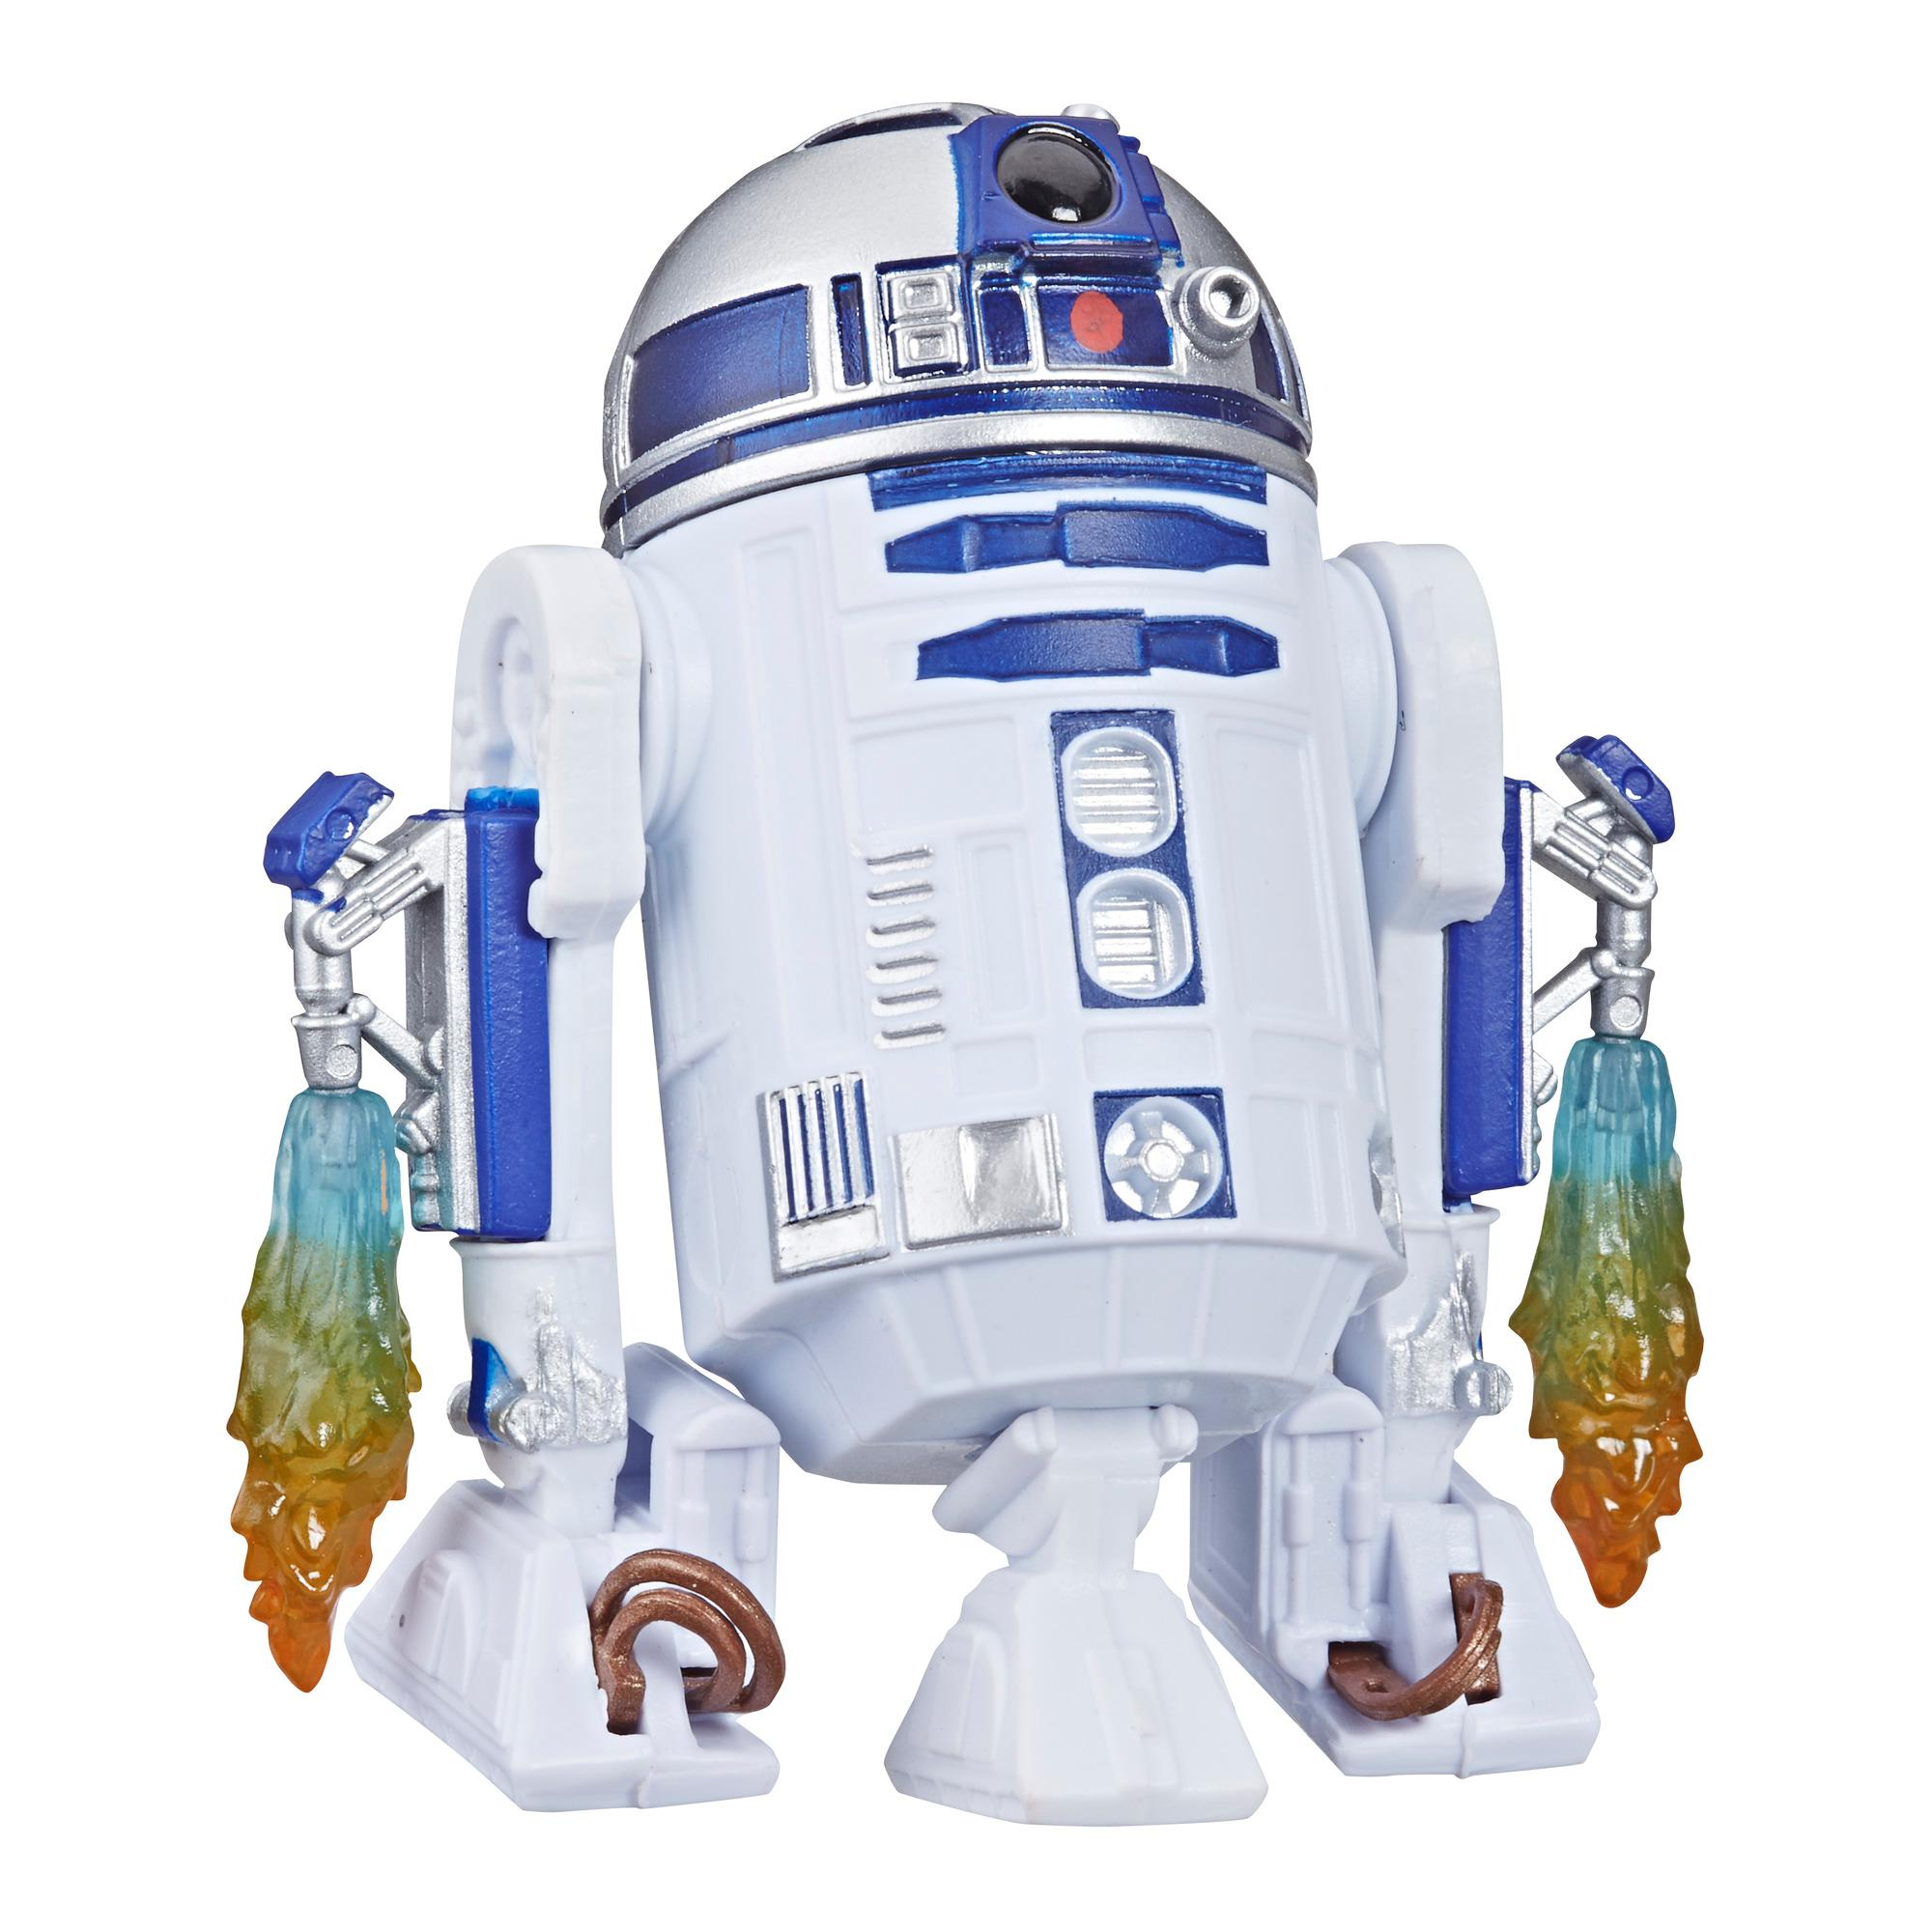 Star Wars Galaxy of Adventures R2-D2 Figure and Mini Comic